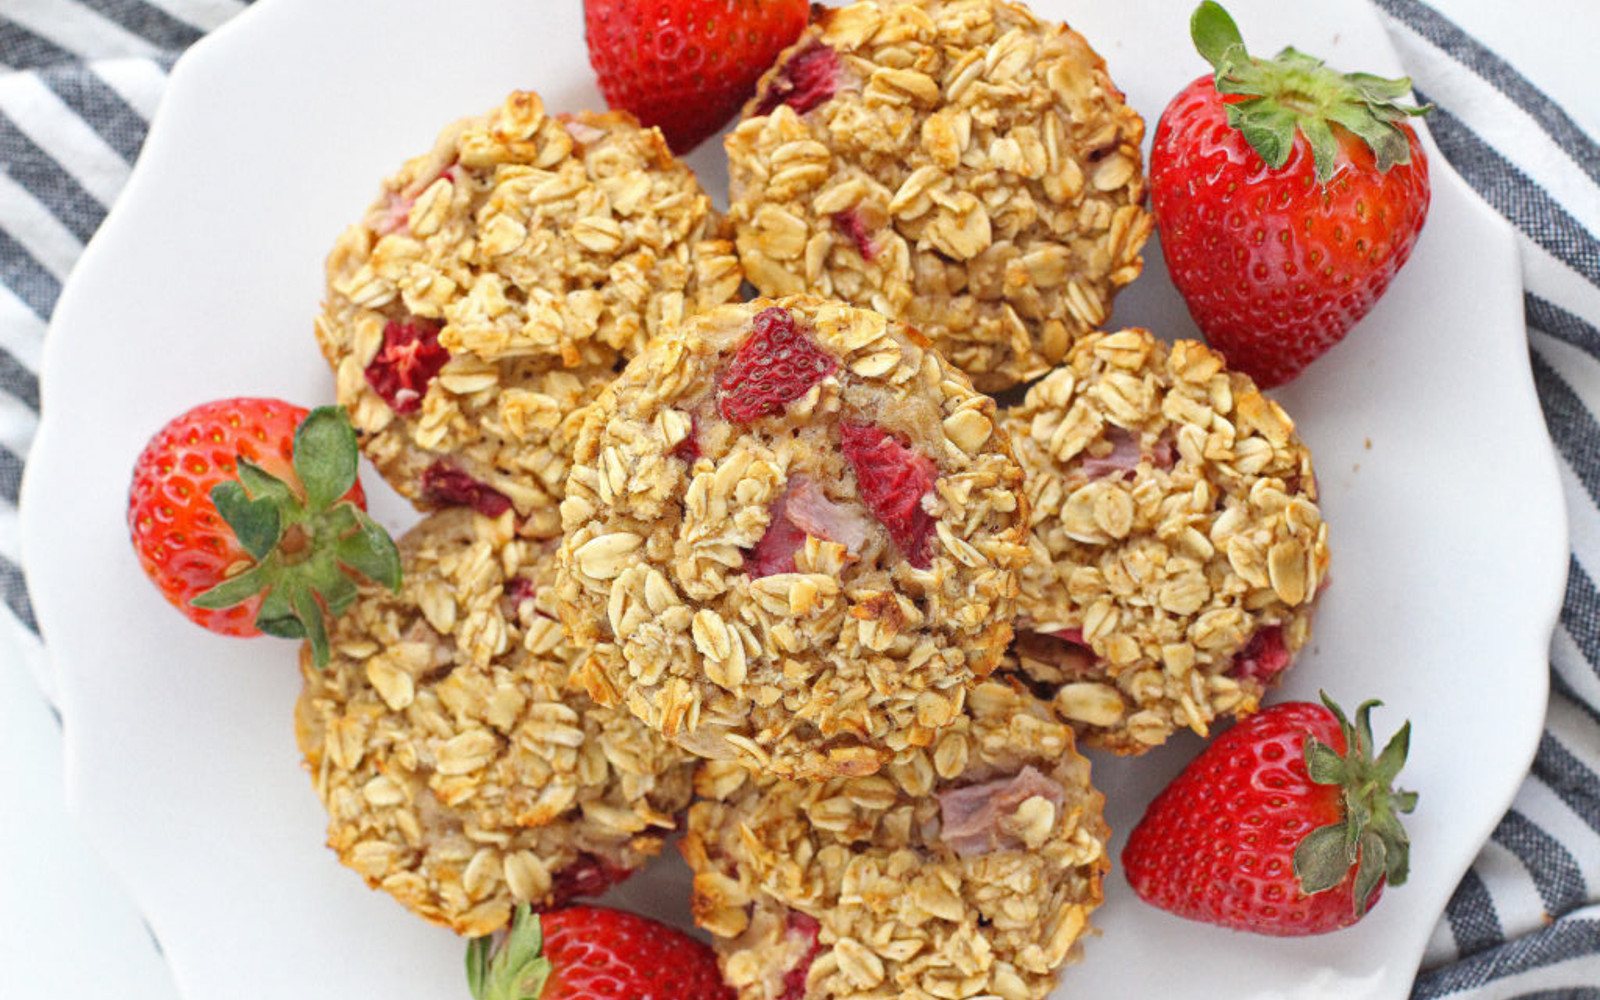 Vegan Gluten-Free Strawberry Banana Baked Oatmeal refined sugar-free with fresh strawberries